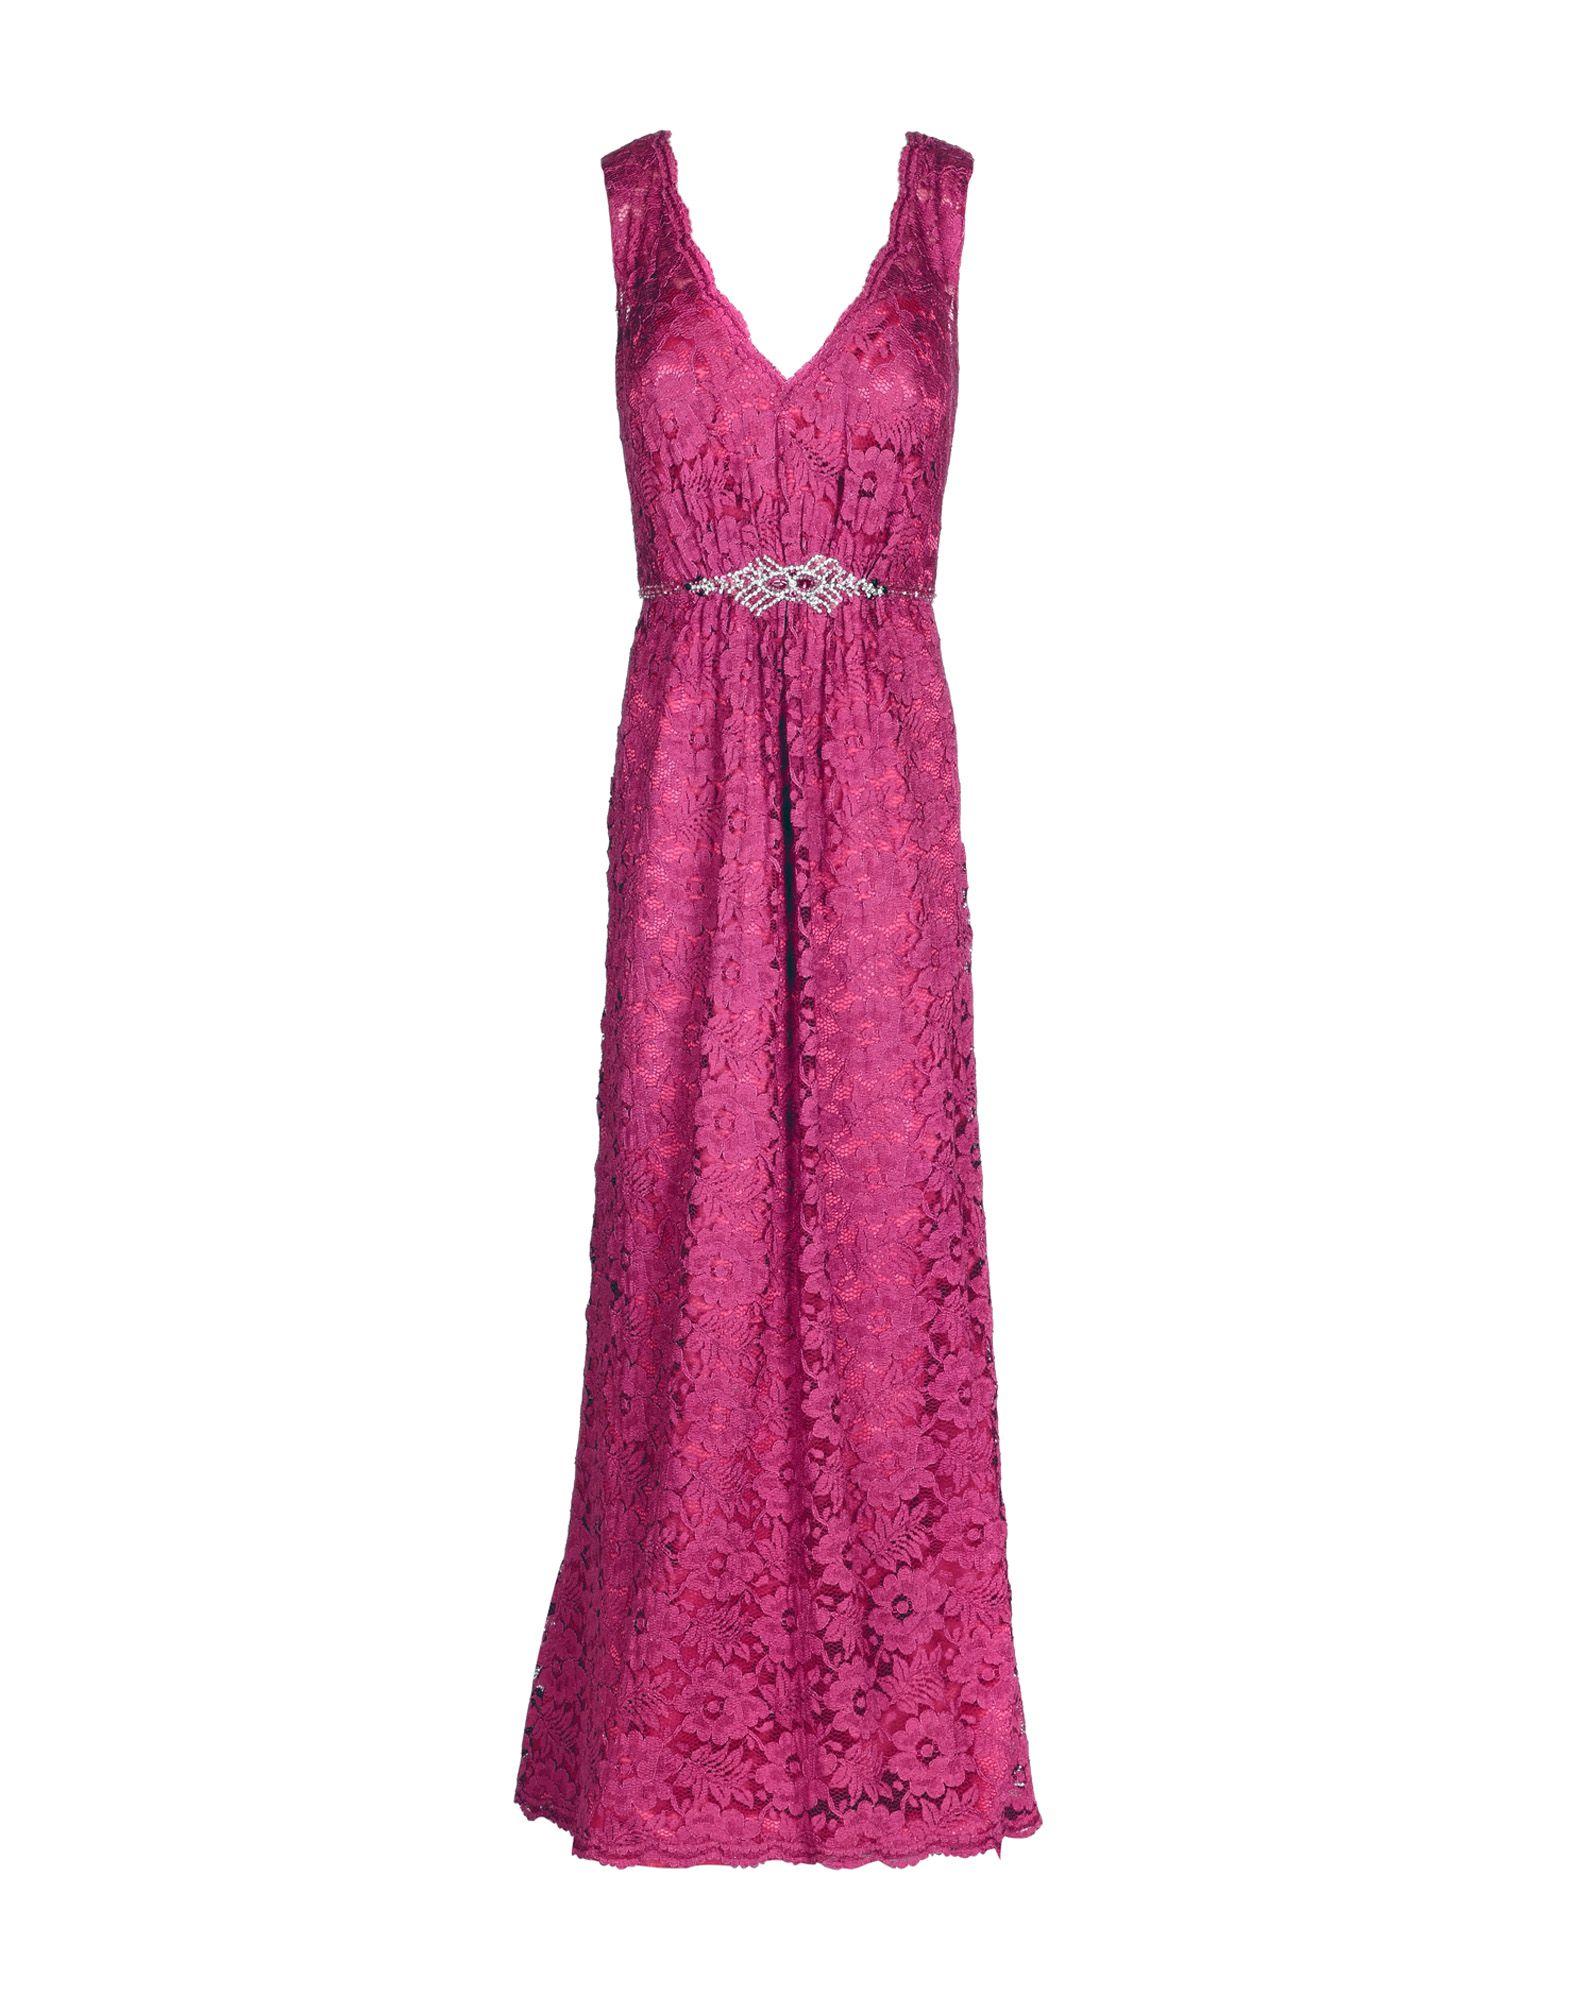 Vestito Lungo Bella Rhapsody By Venus Bridal Donna - Acquista online su d1C4k4LpV